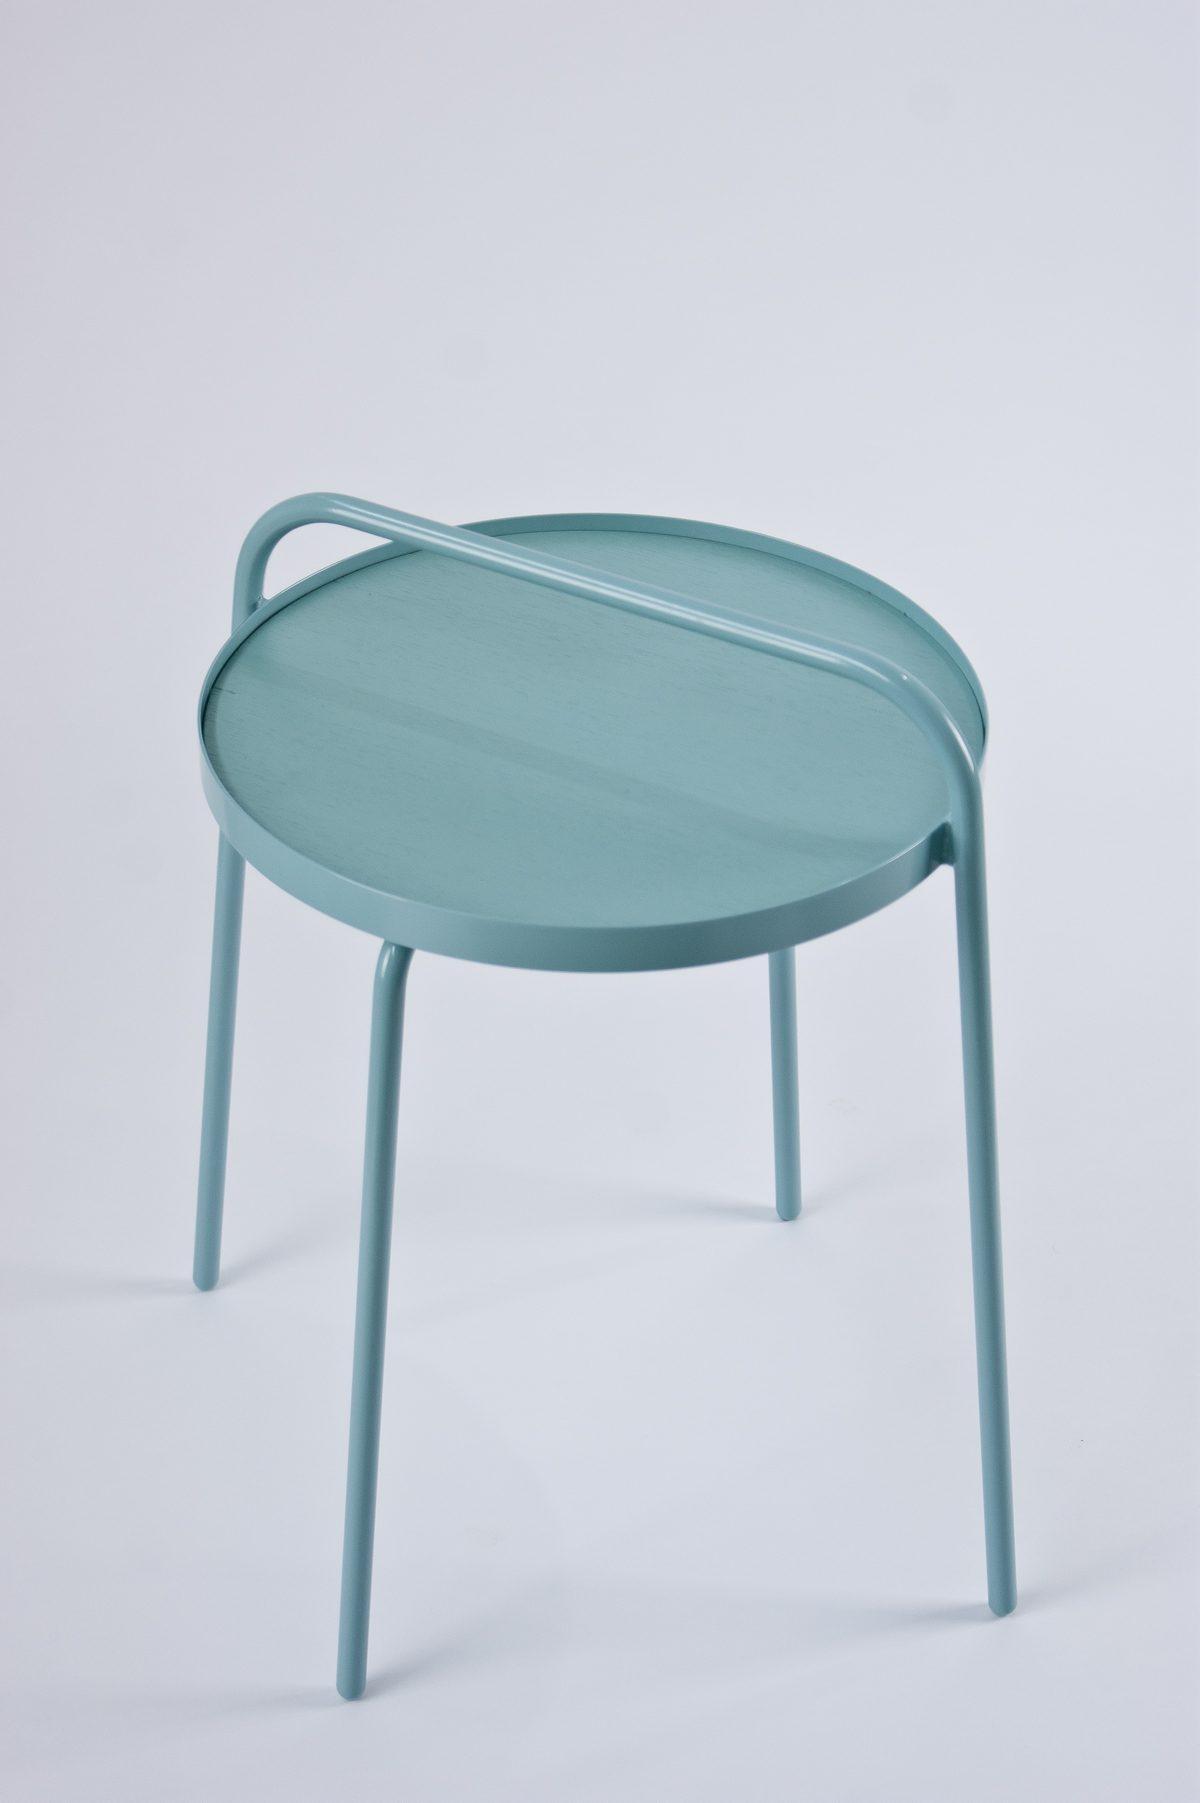 Patrick Hartog Bucket bijzettafel sidetable pastel turquoise – gimmiishop